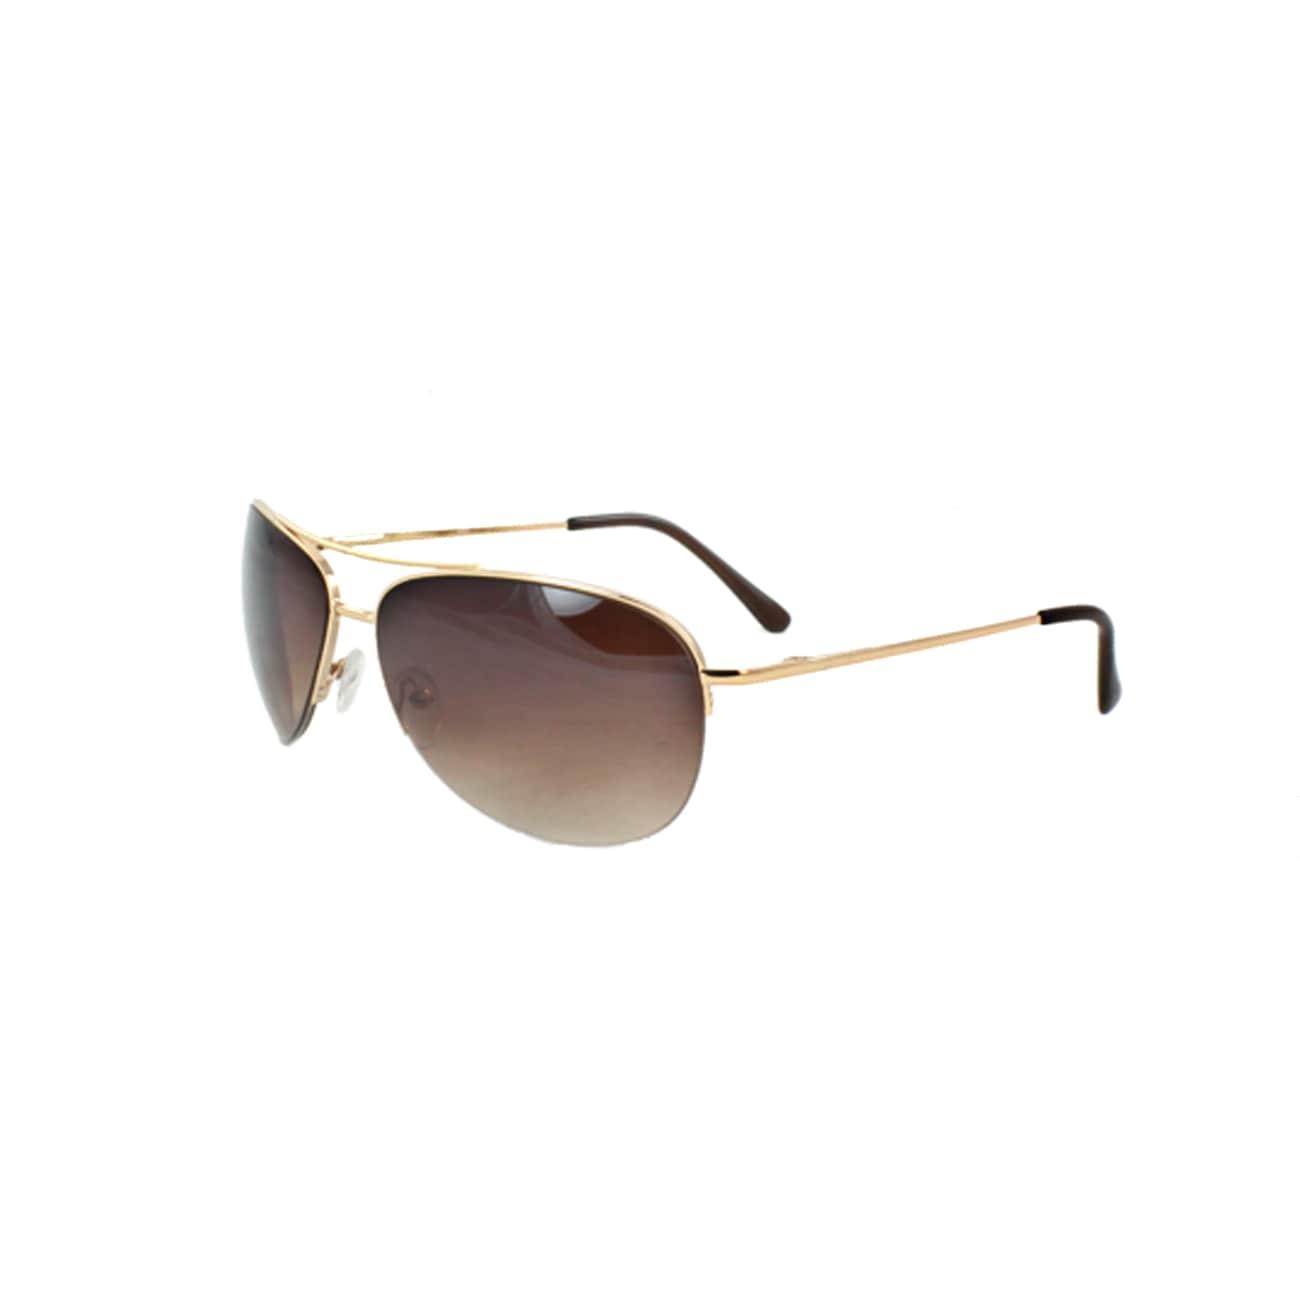 Unisex 669GDAM Gold/ Amber Aviator Sunglasses